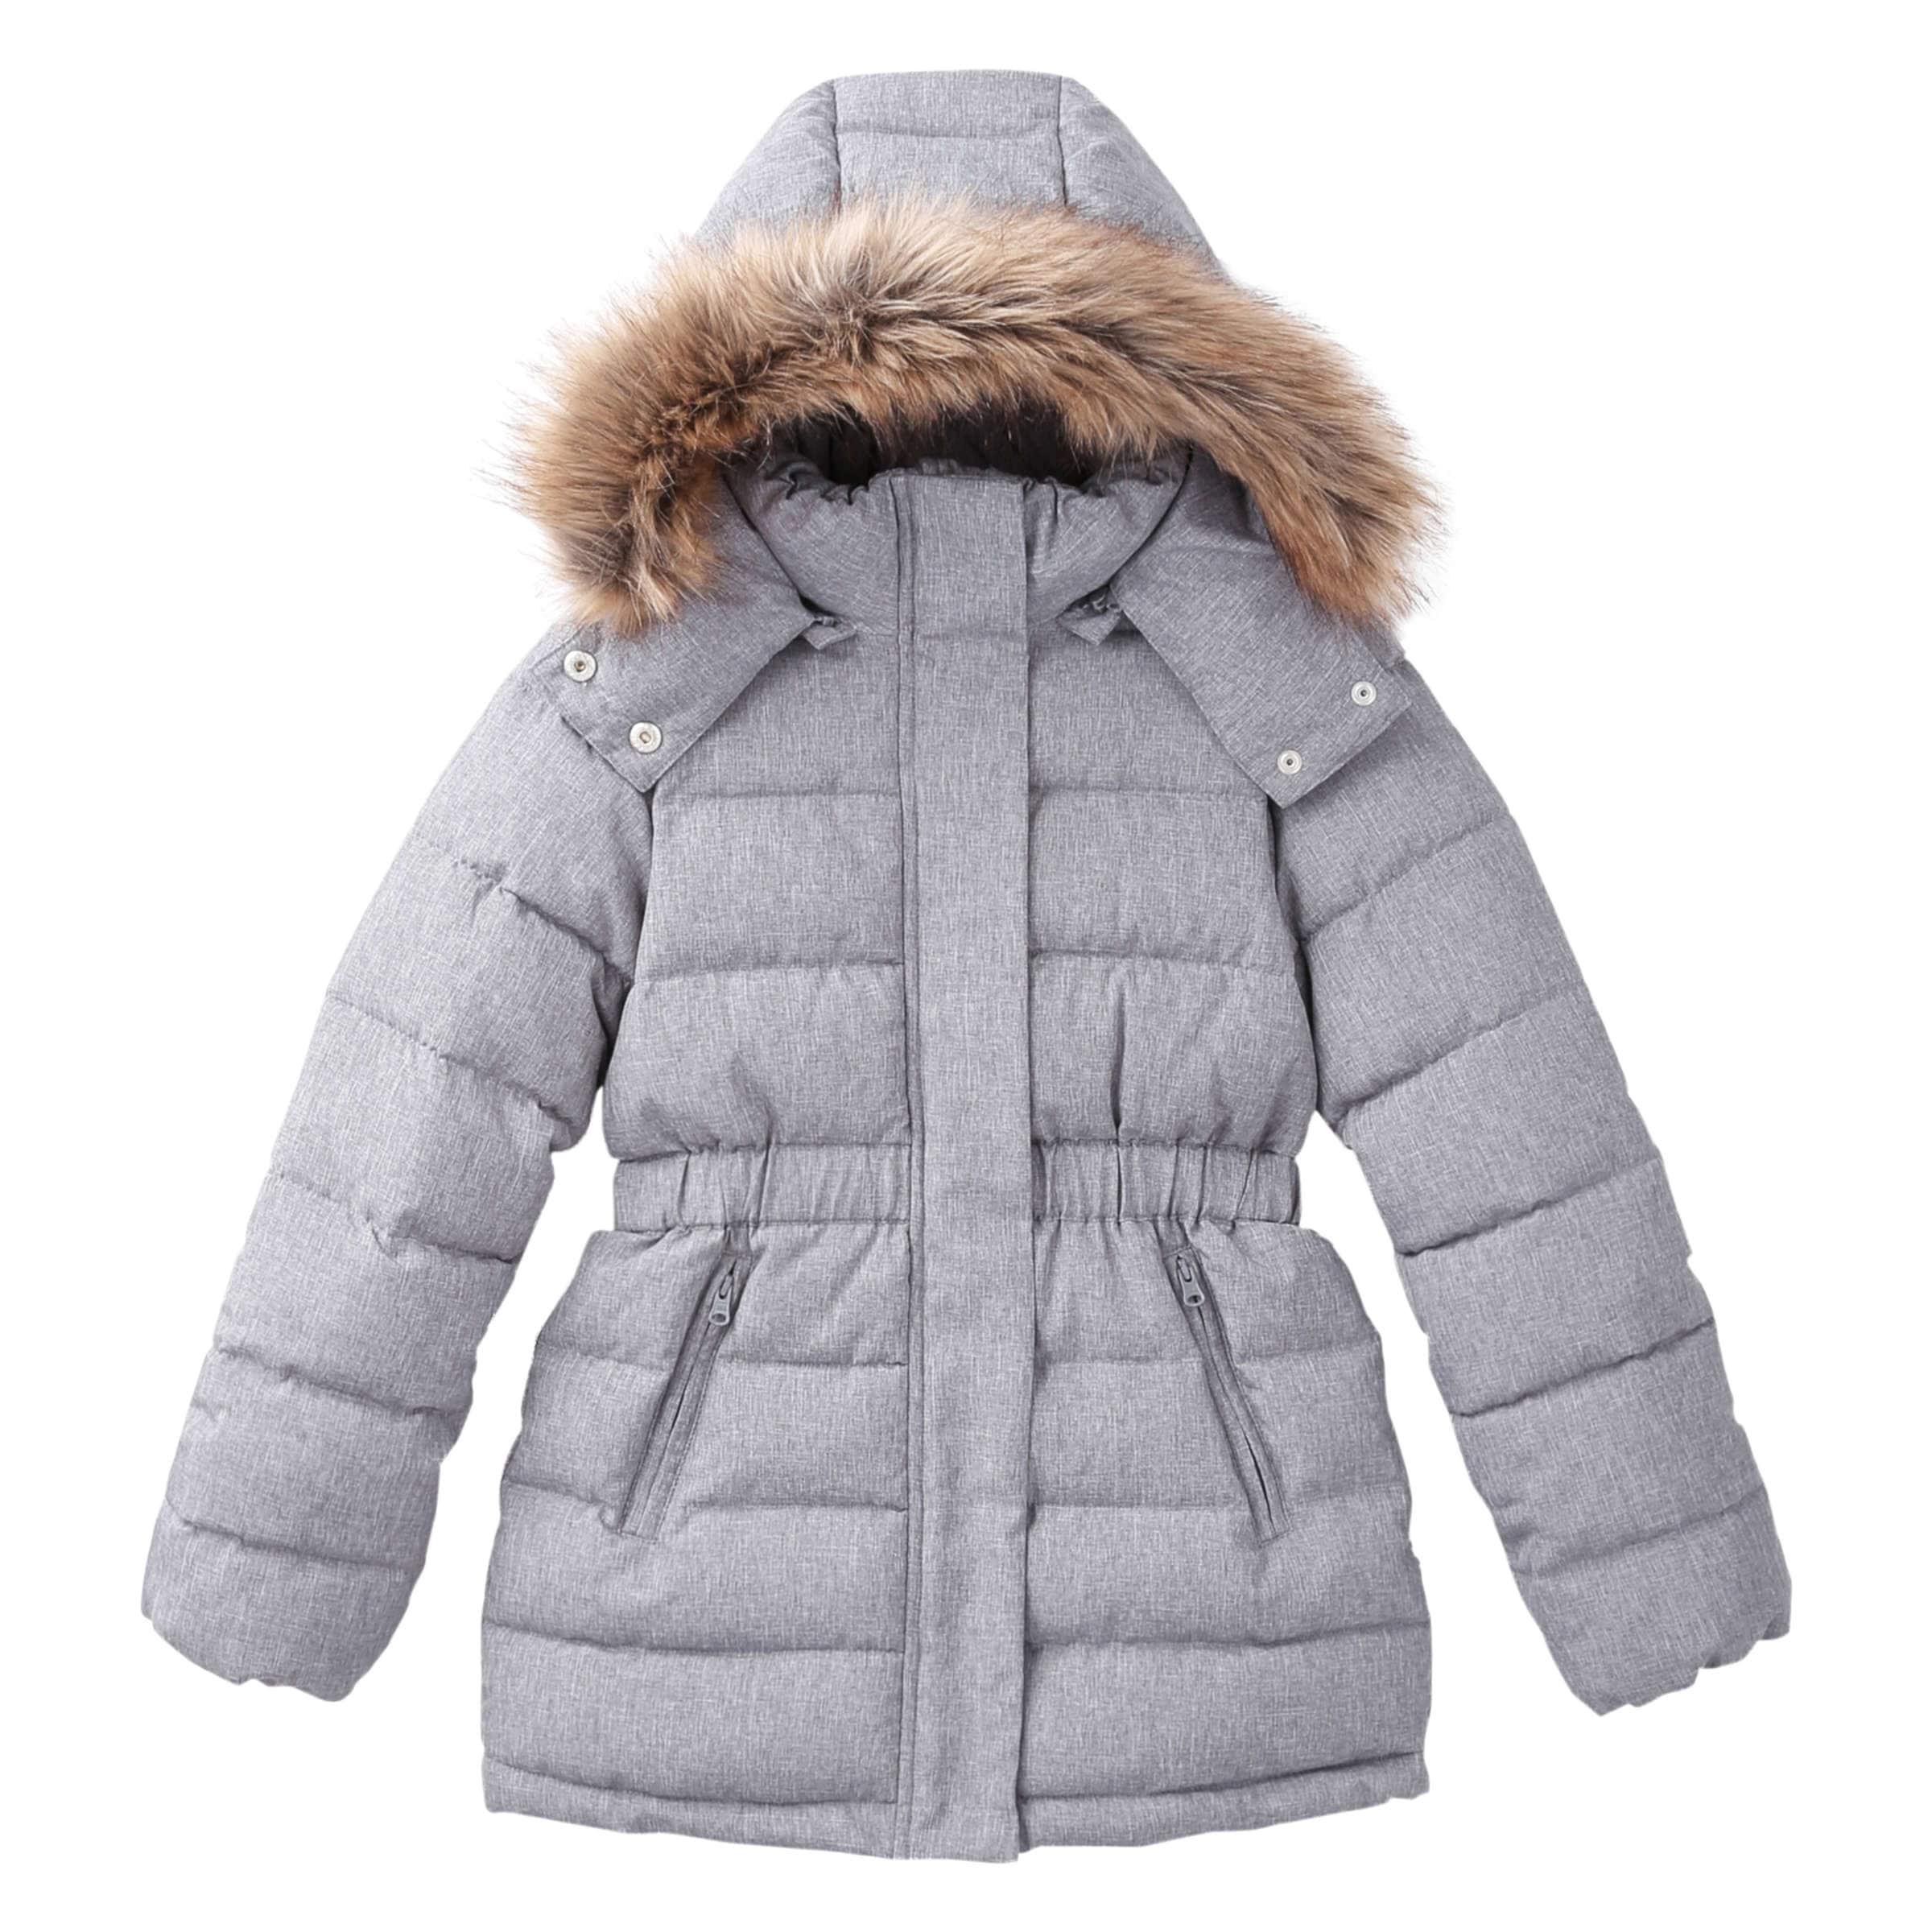 71a6b0b2e Joe Fresh Kid Girls' Long Puffer Jacket